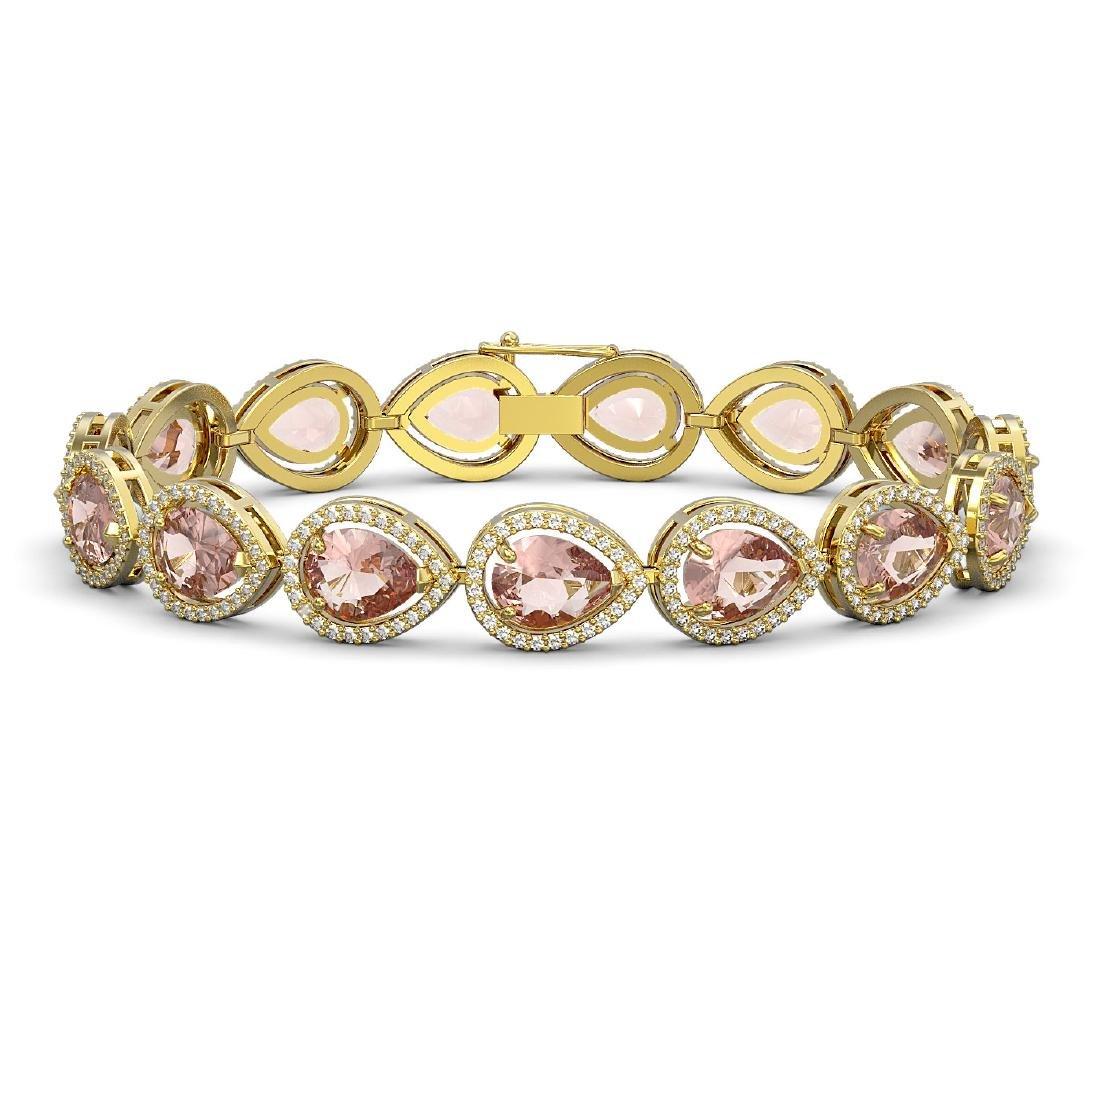 19.55 CTW Morganite & Diamond Halo Bracelet 10K Yellow